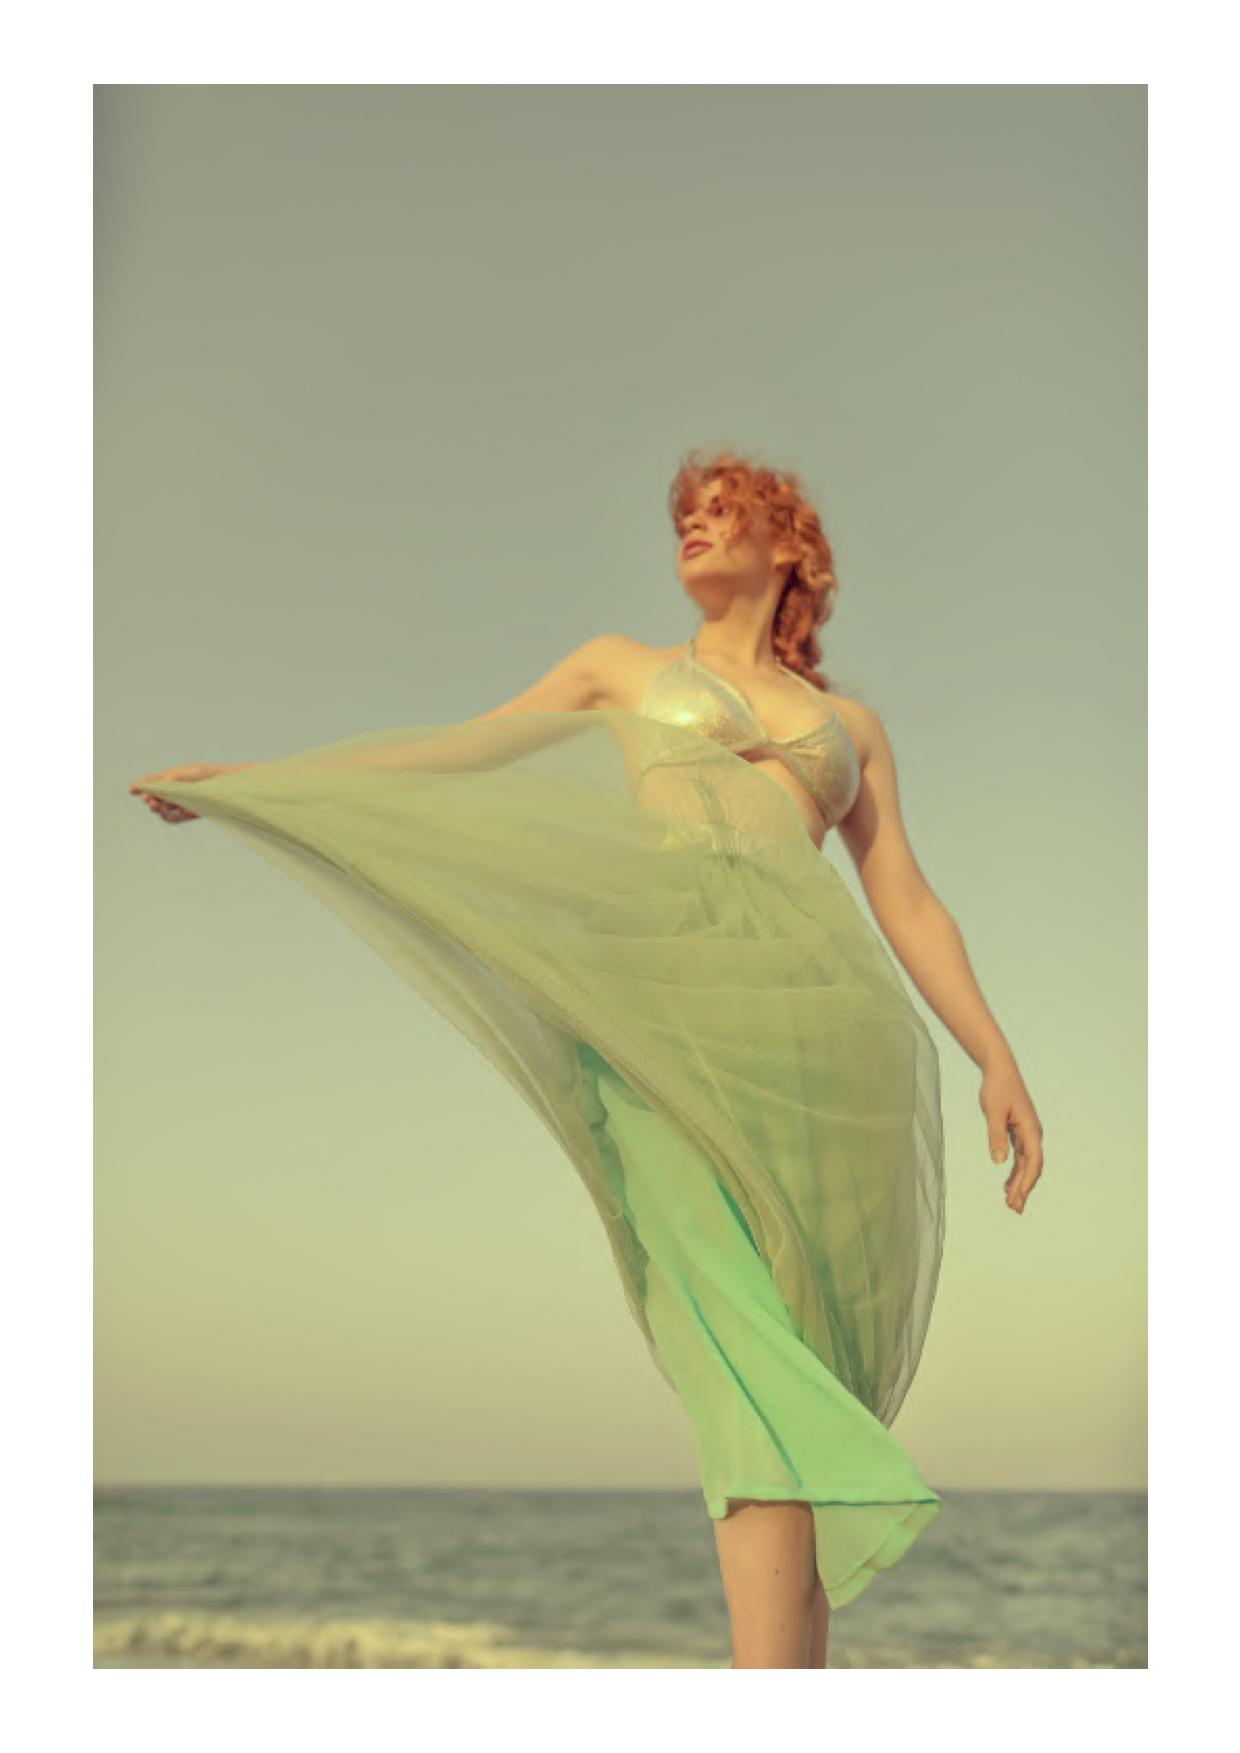 breeze and sara fashion story photography editorial Giovanni Cardinni le dernier etage magazine webzine